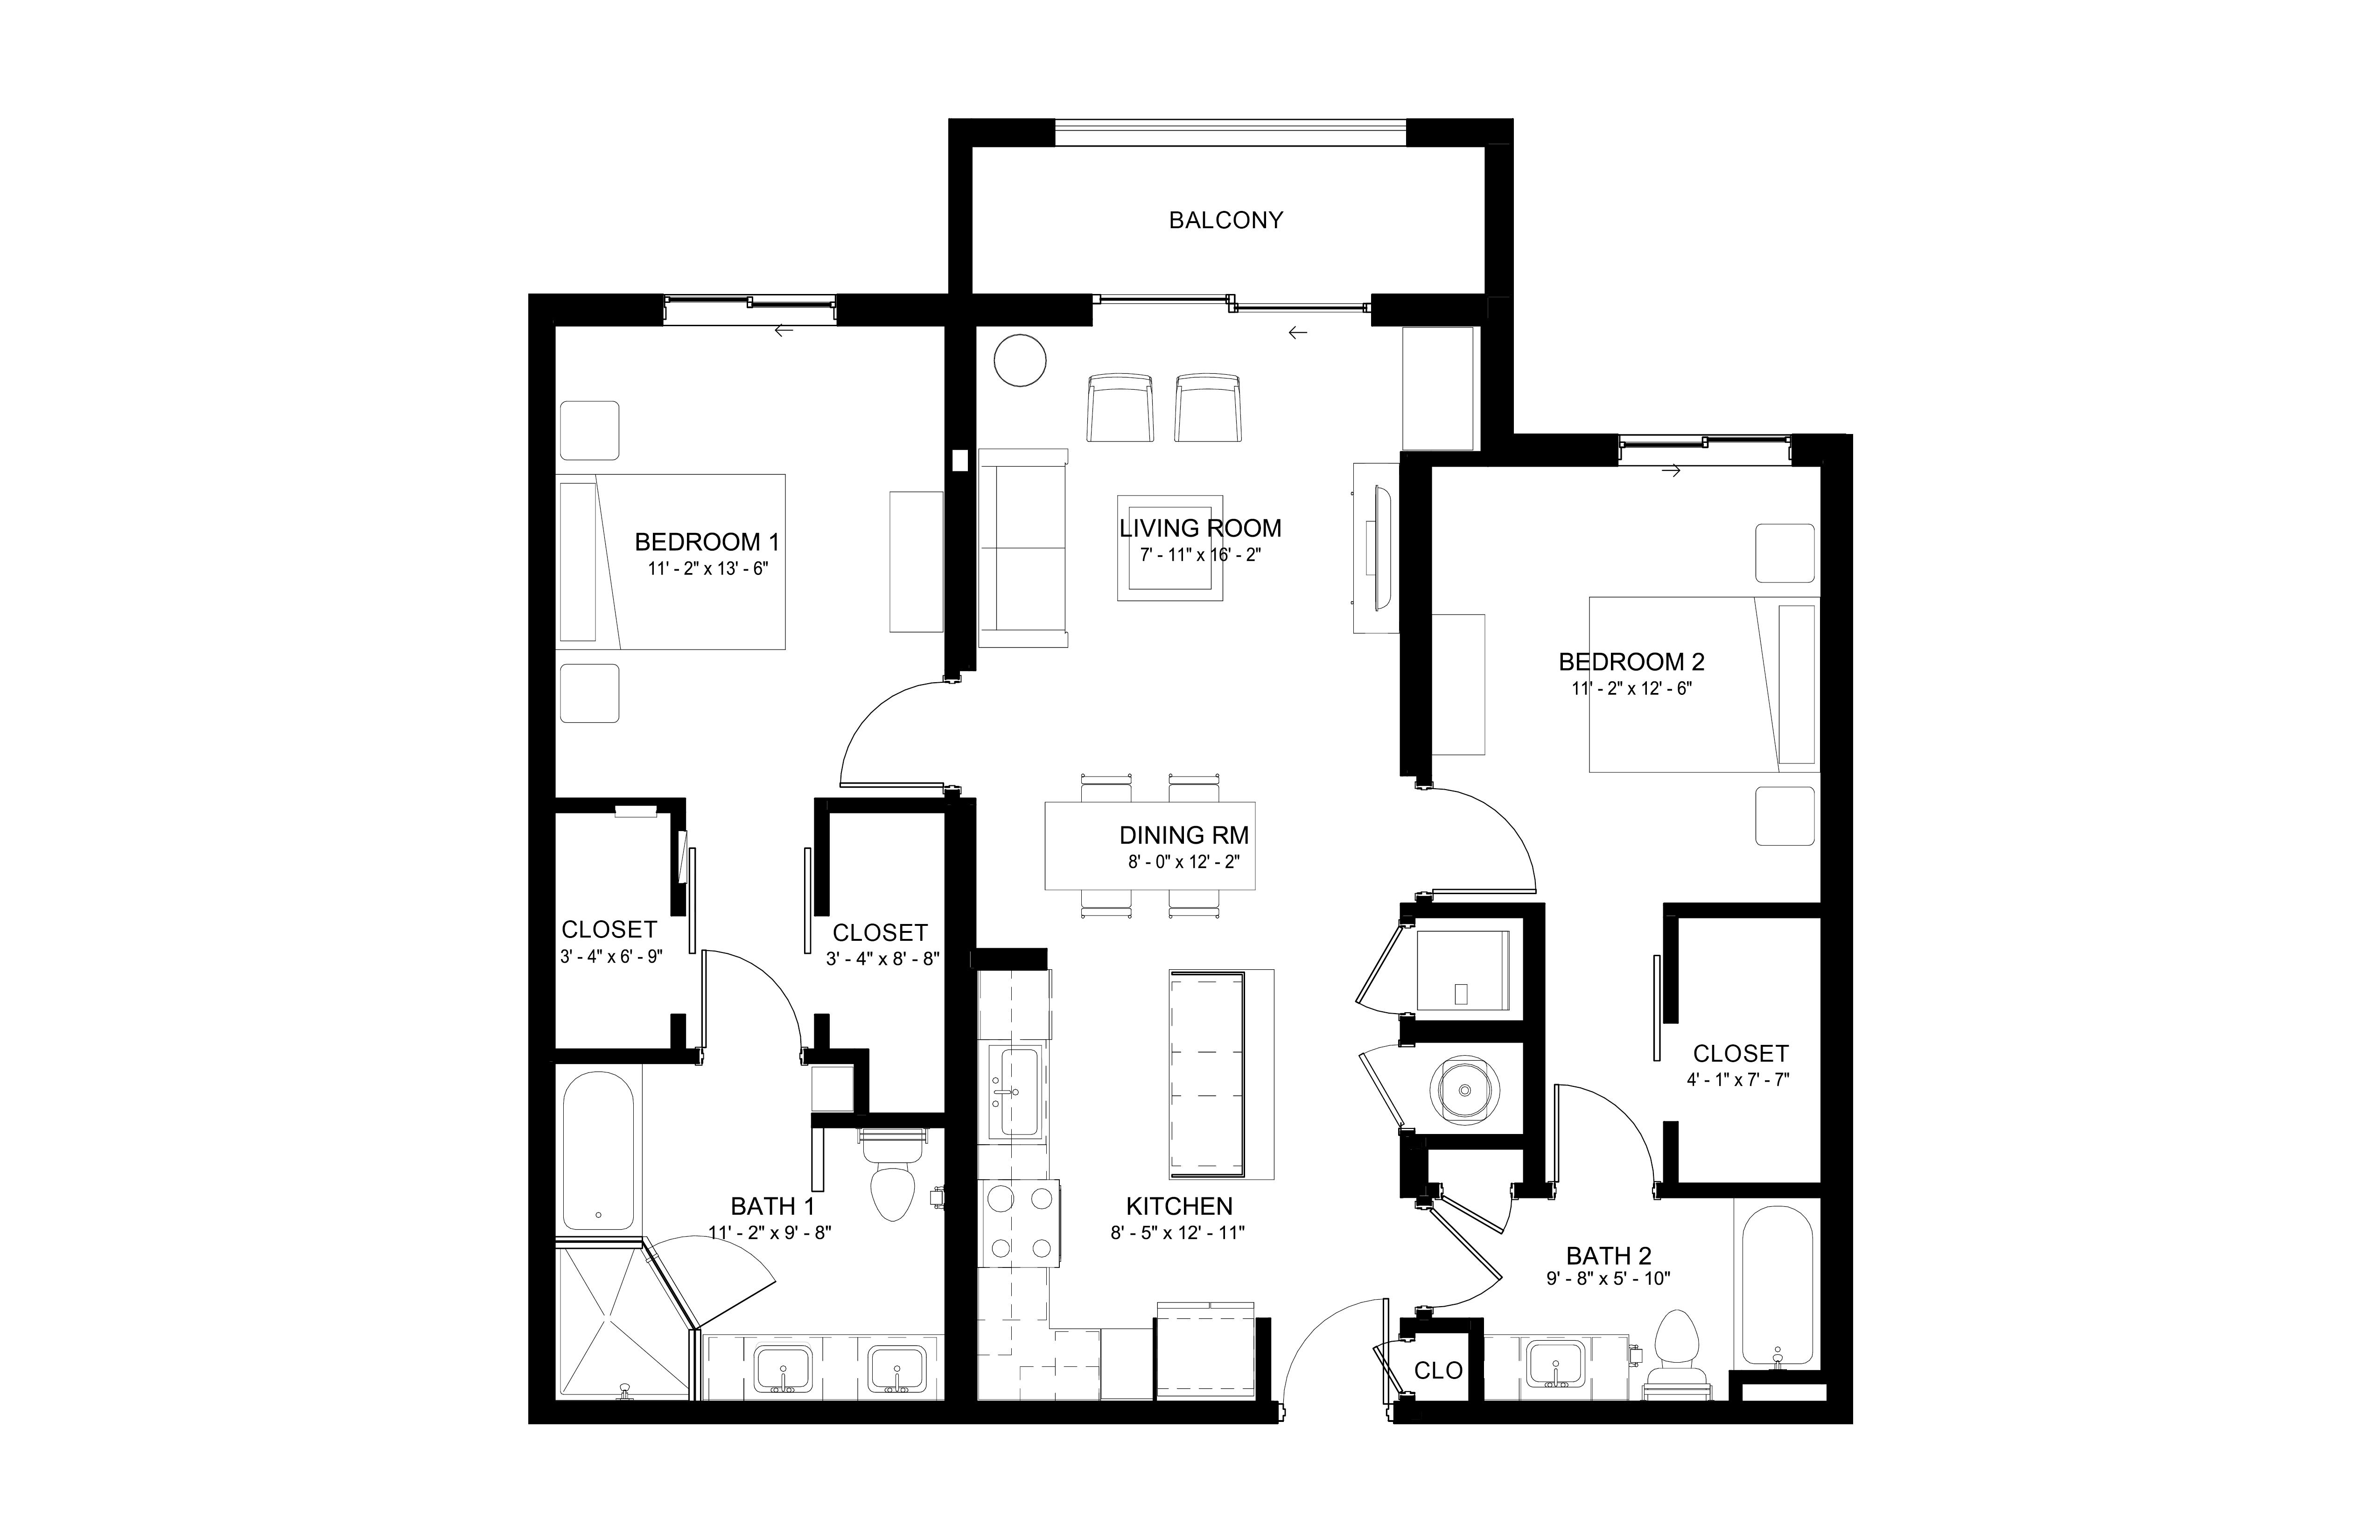 Apartment 130 floorplan